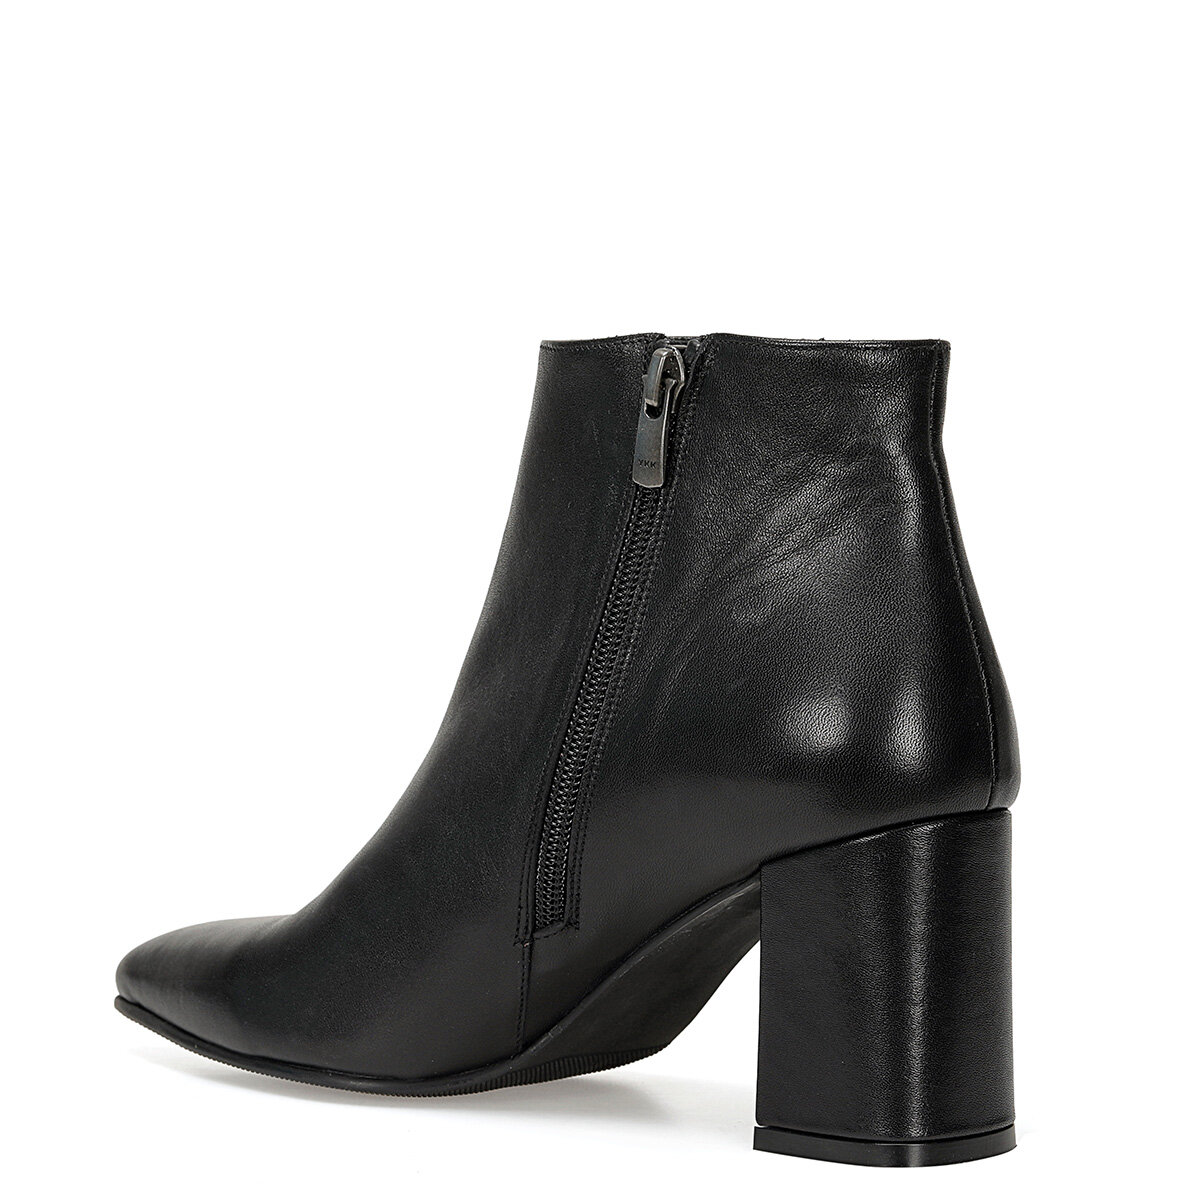 GALO Siyah Kadın Topuklu Ayakkabı